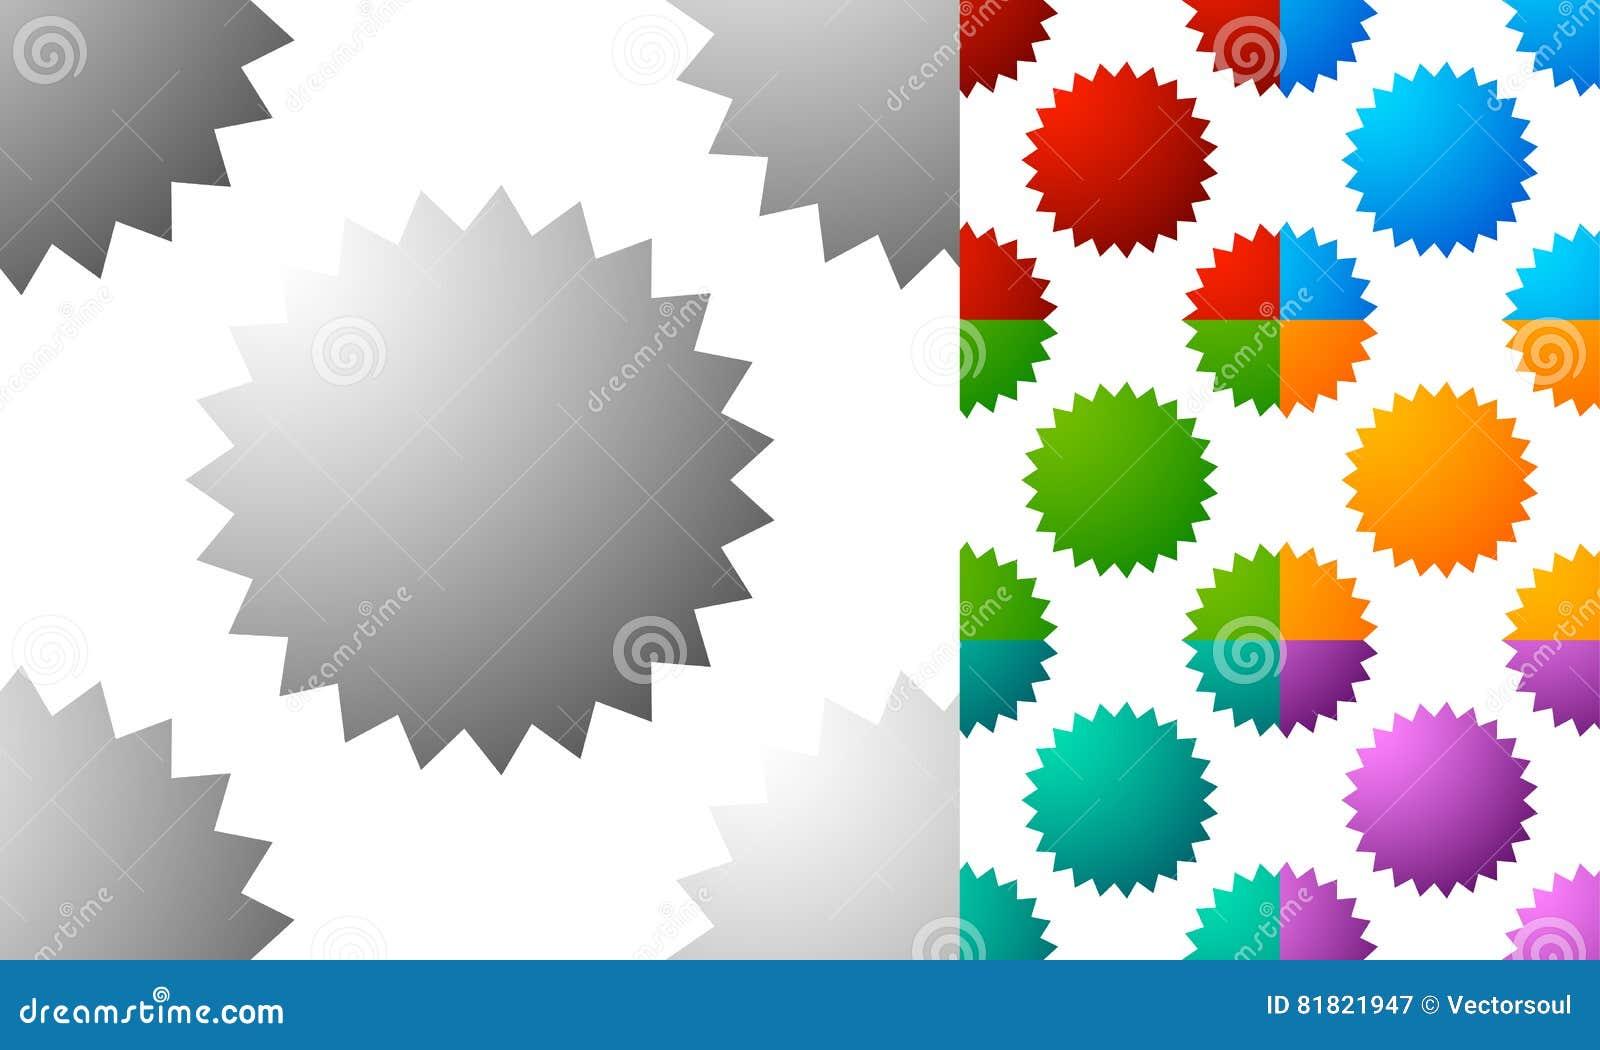 Pattern / Background Set With Badge, Starburst-like Shapes  Set